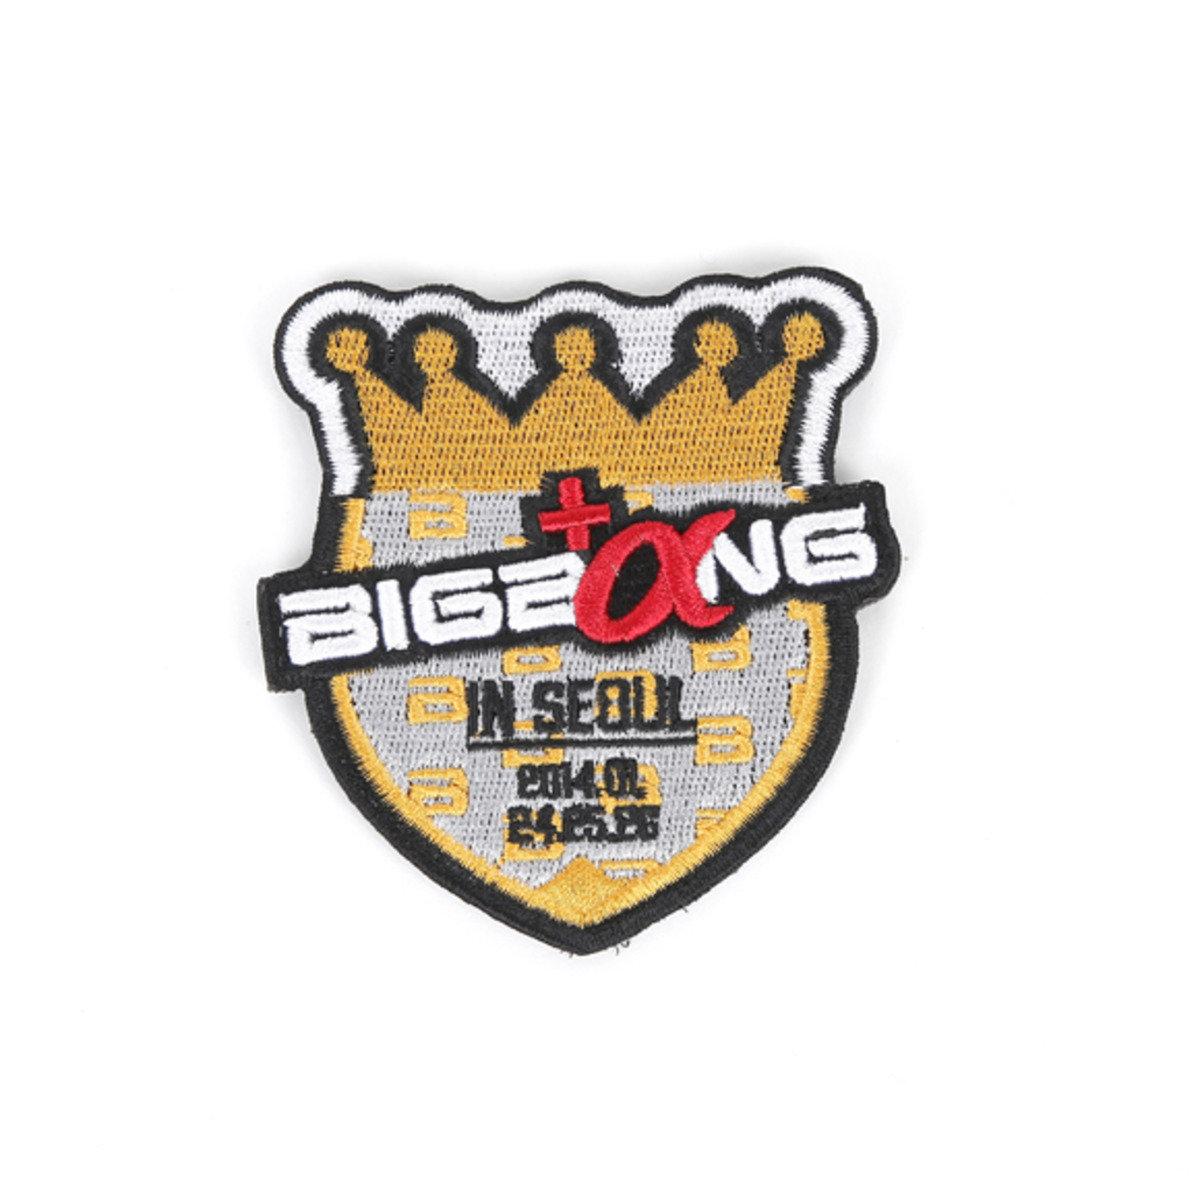 BIGBANG Concert 徵章(限量版)_48274